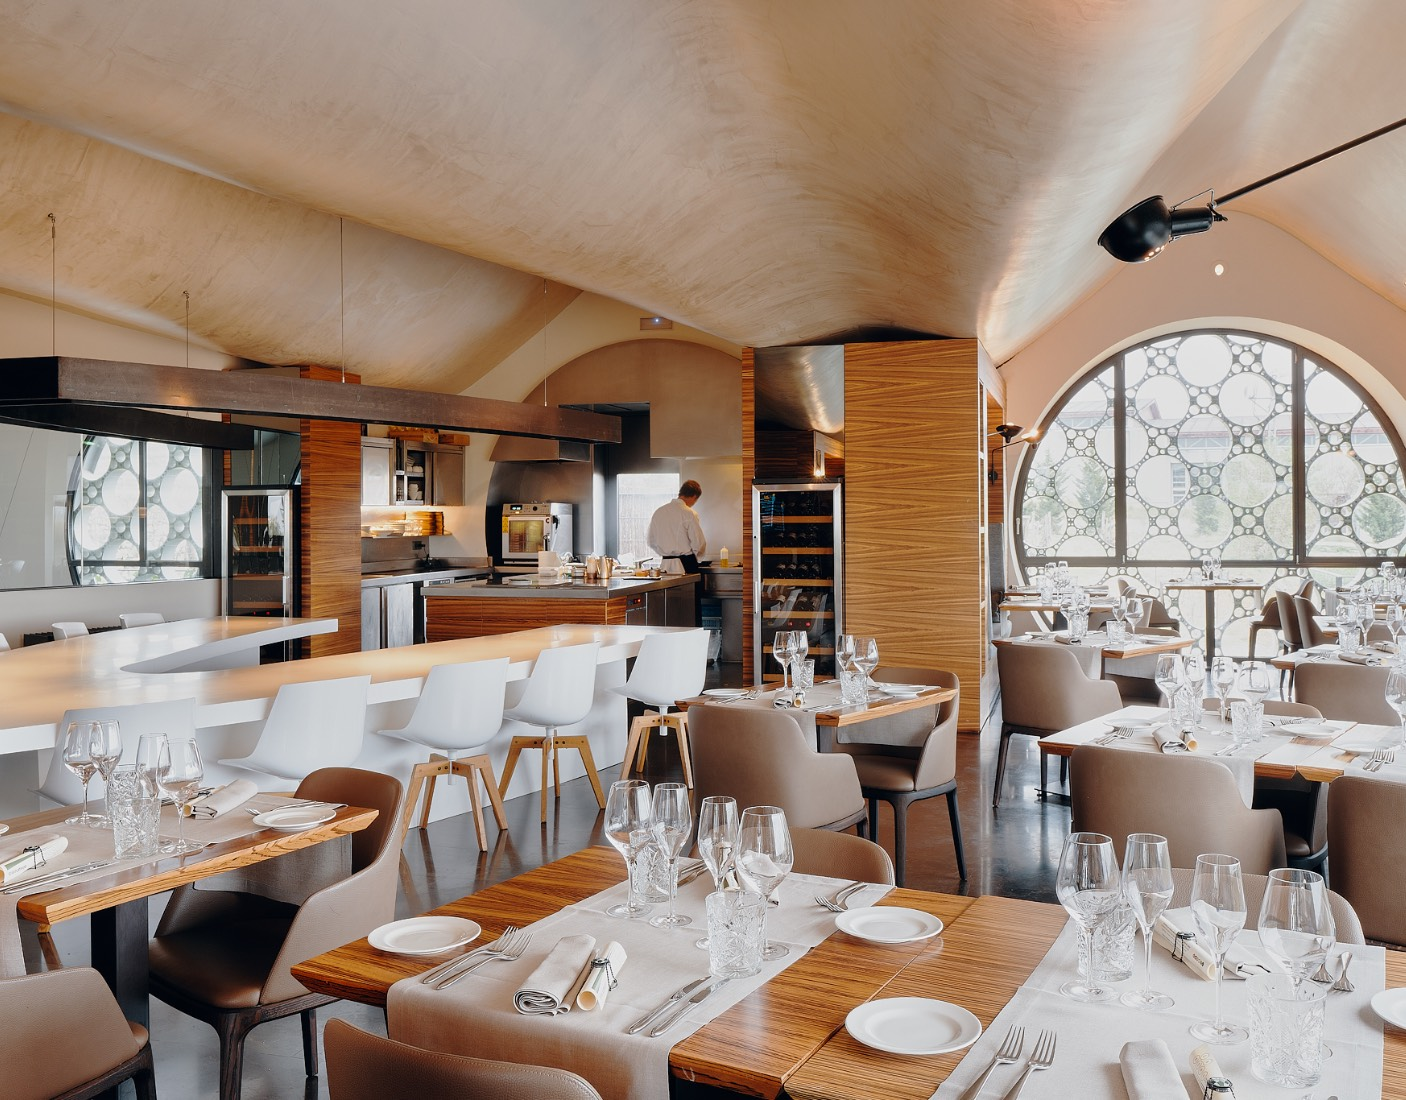 espacio restaurante En Rima Mastinell hotel con bodega